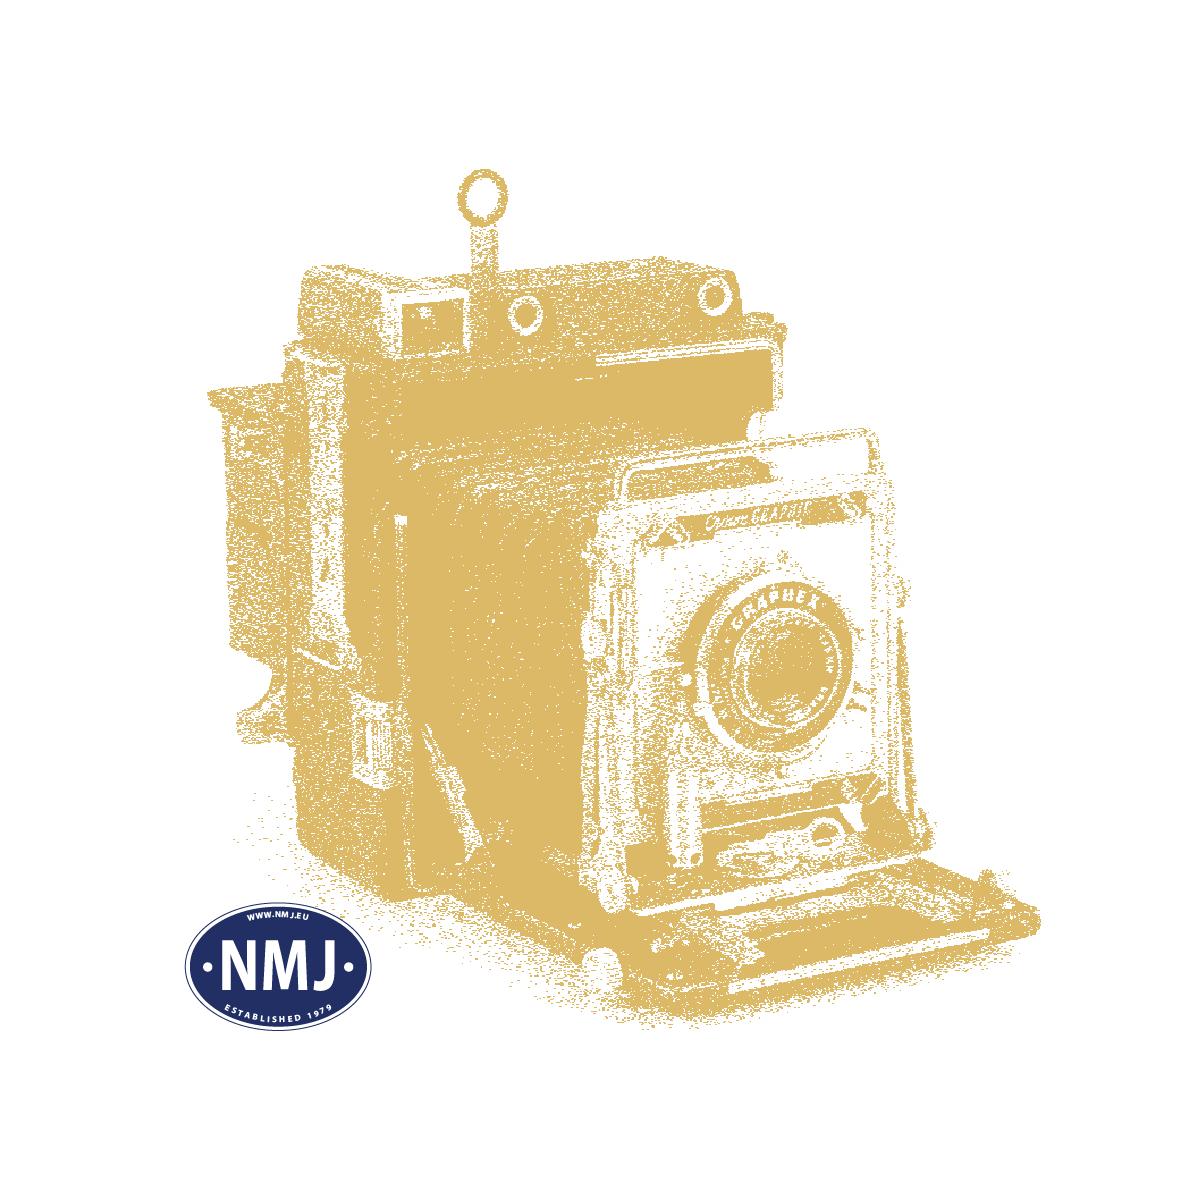 NOC07014 - Gresstuster / Villblomster, 92 Stk